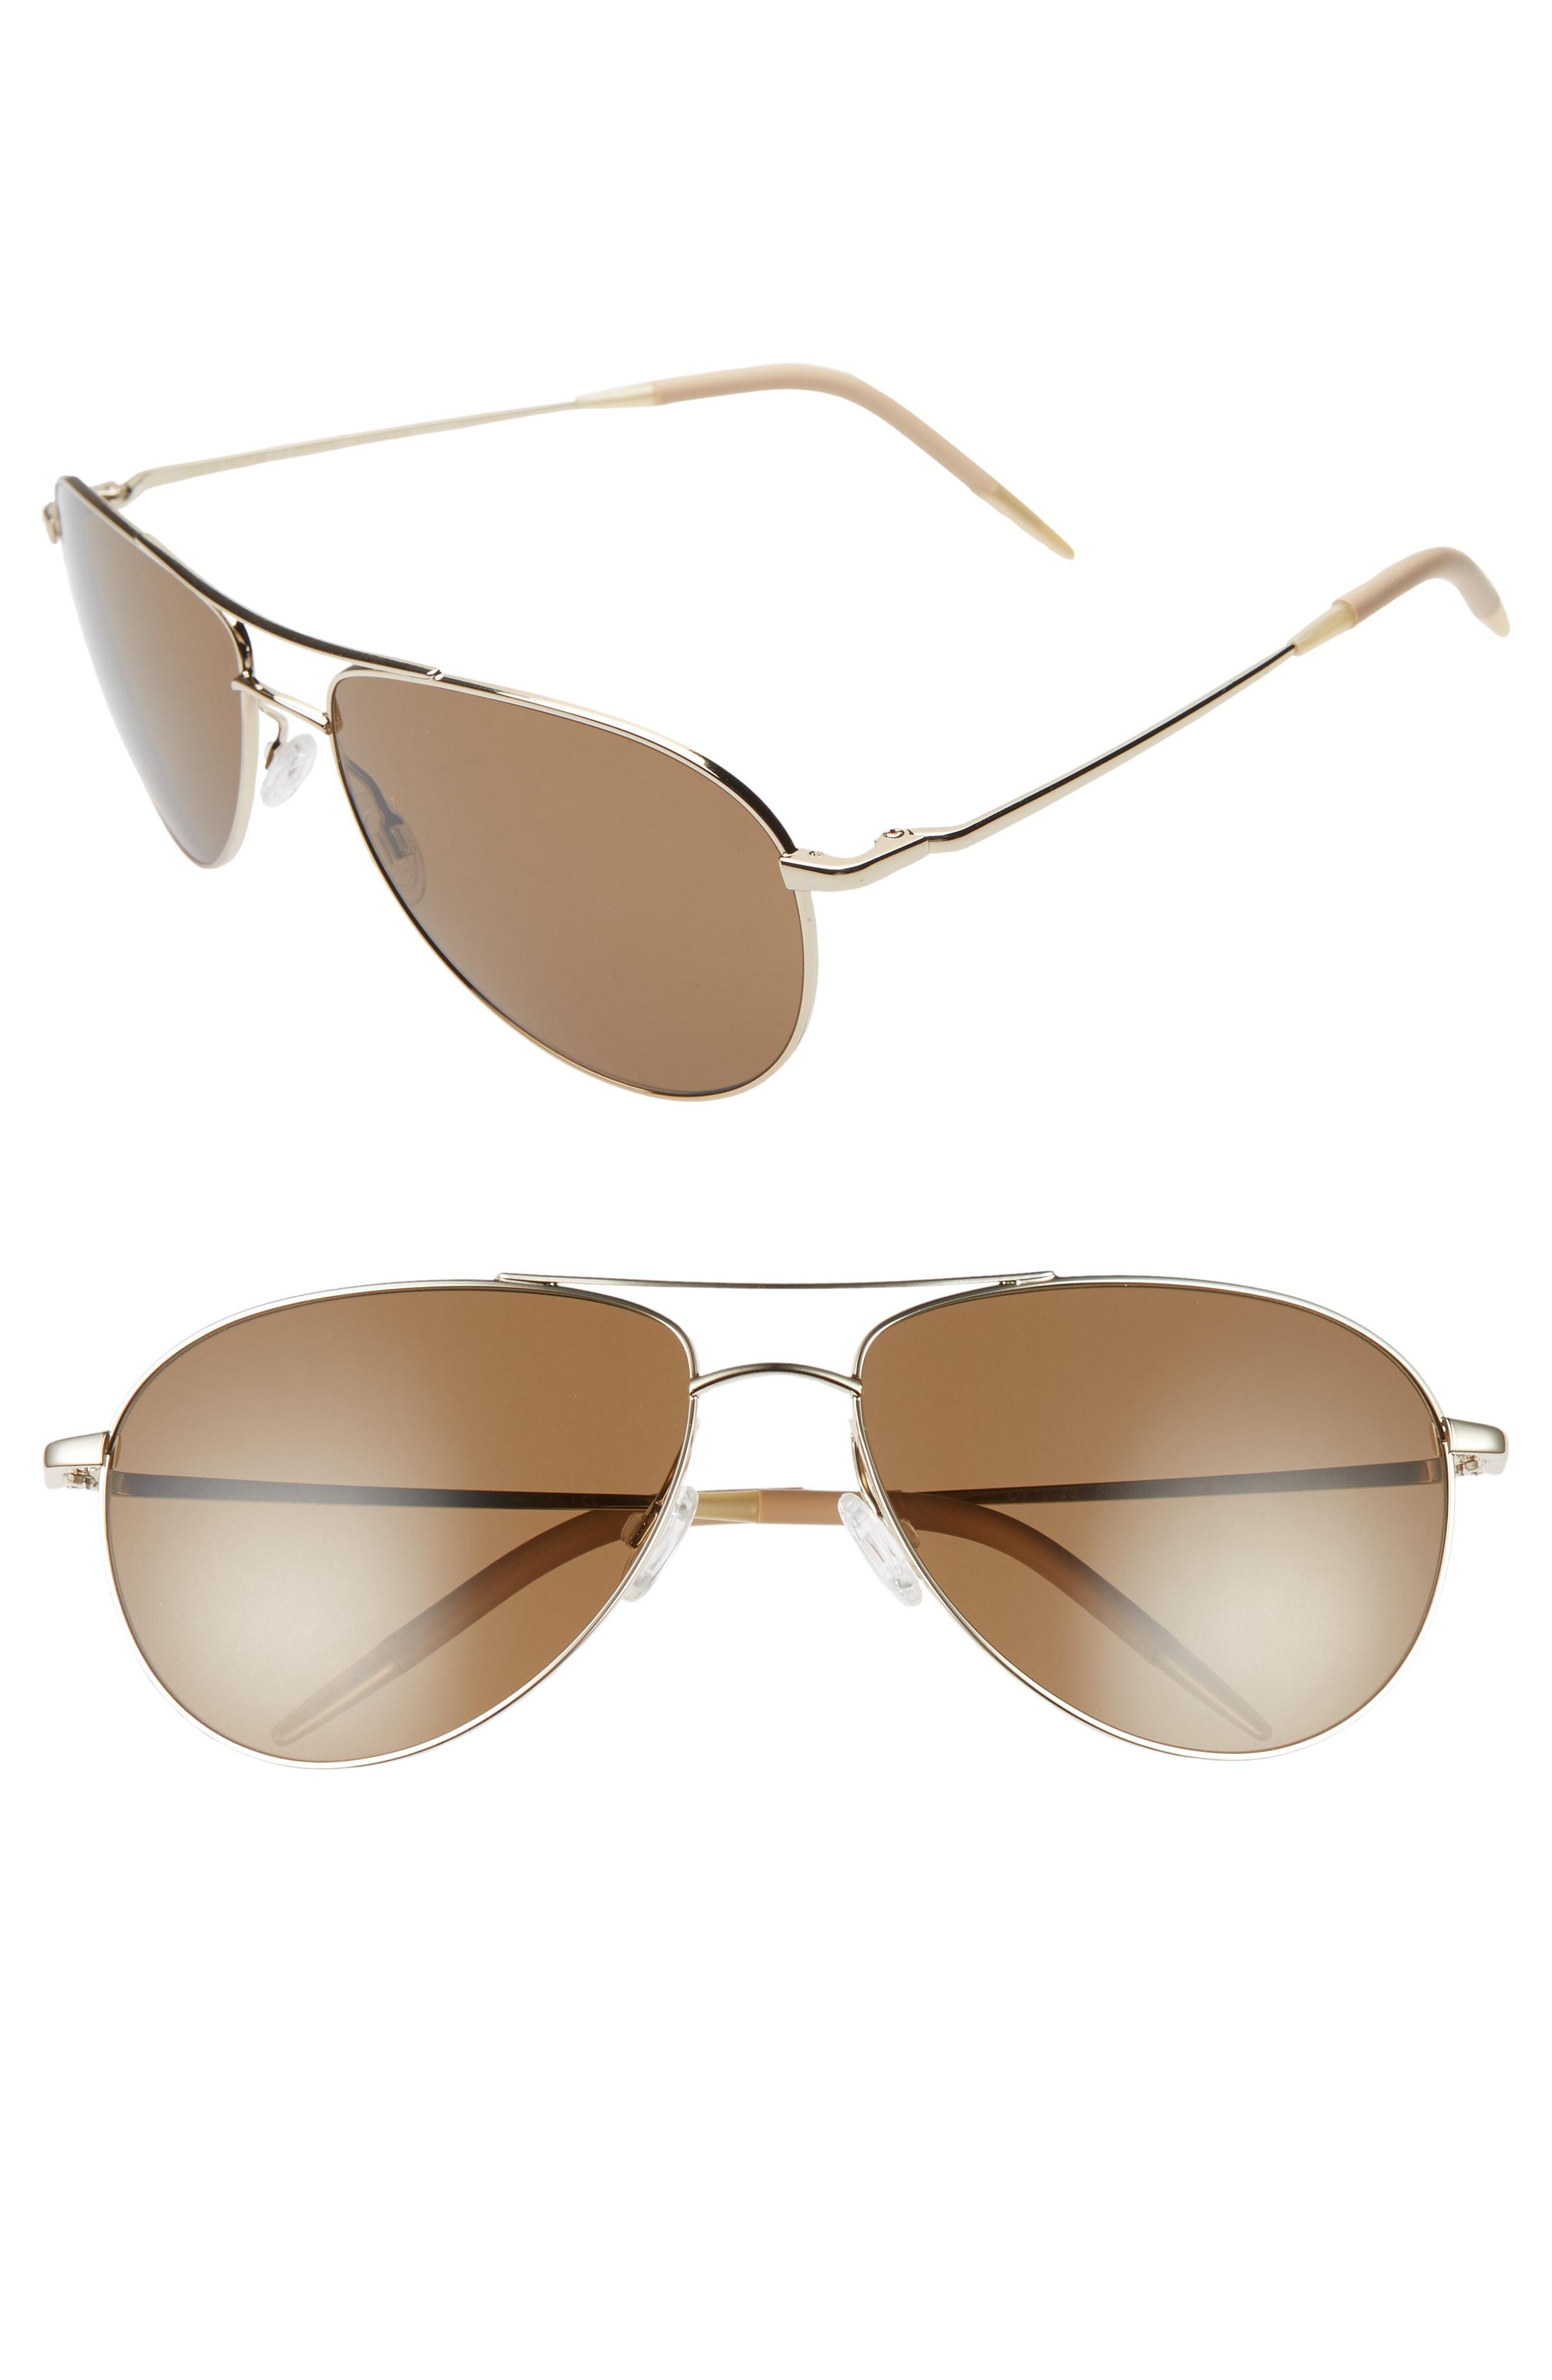 4b1c0af9eba Oliver Peoples. Women s Benedict 59mm Aviator Sunglasses - Soft Gold  Brown